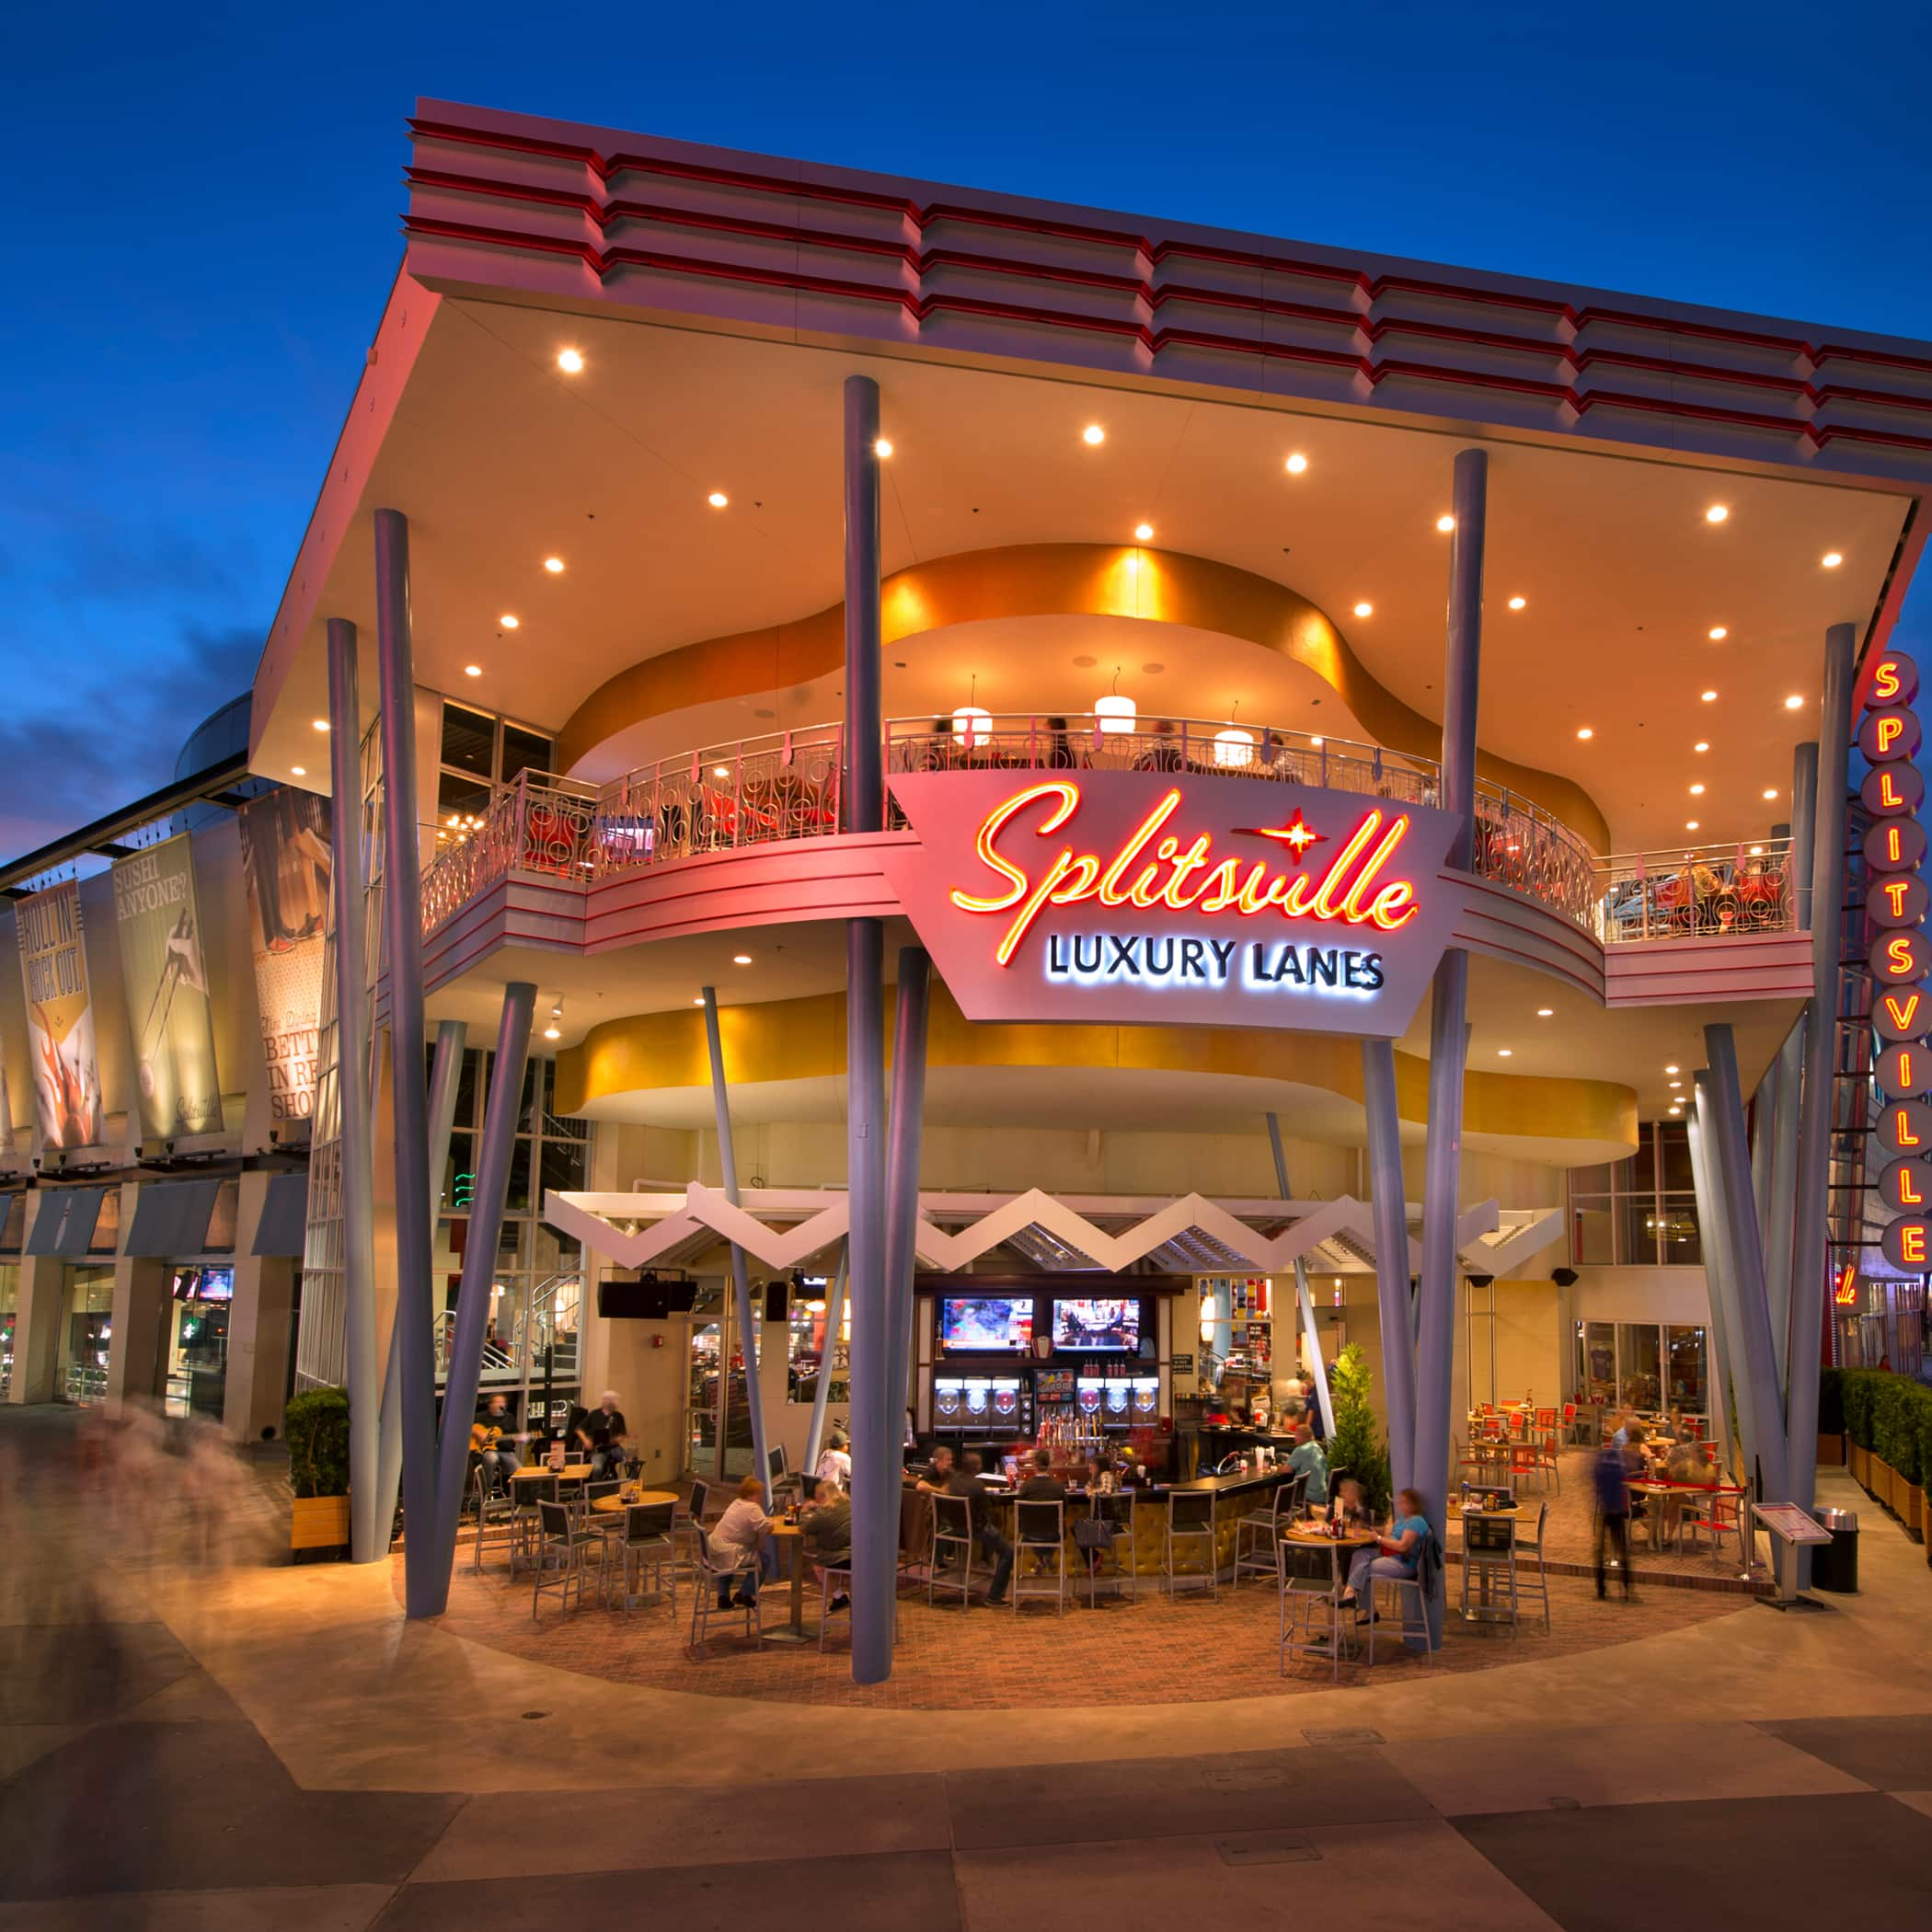 The exterior of Splitsville Luxury Lanes at Disney Springs in Florida, illuminated at night